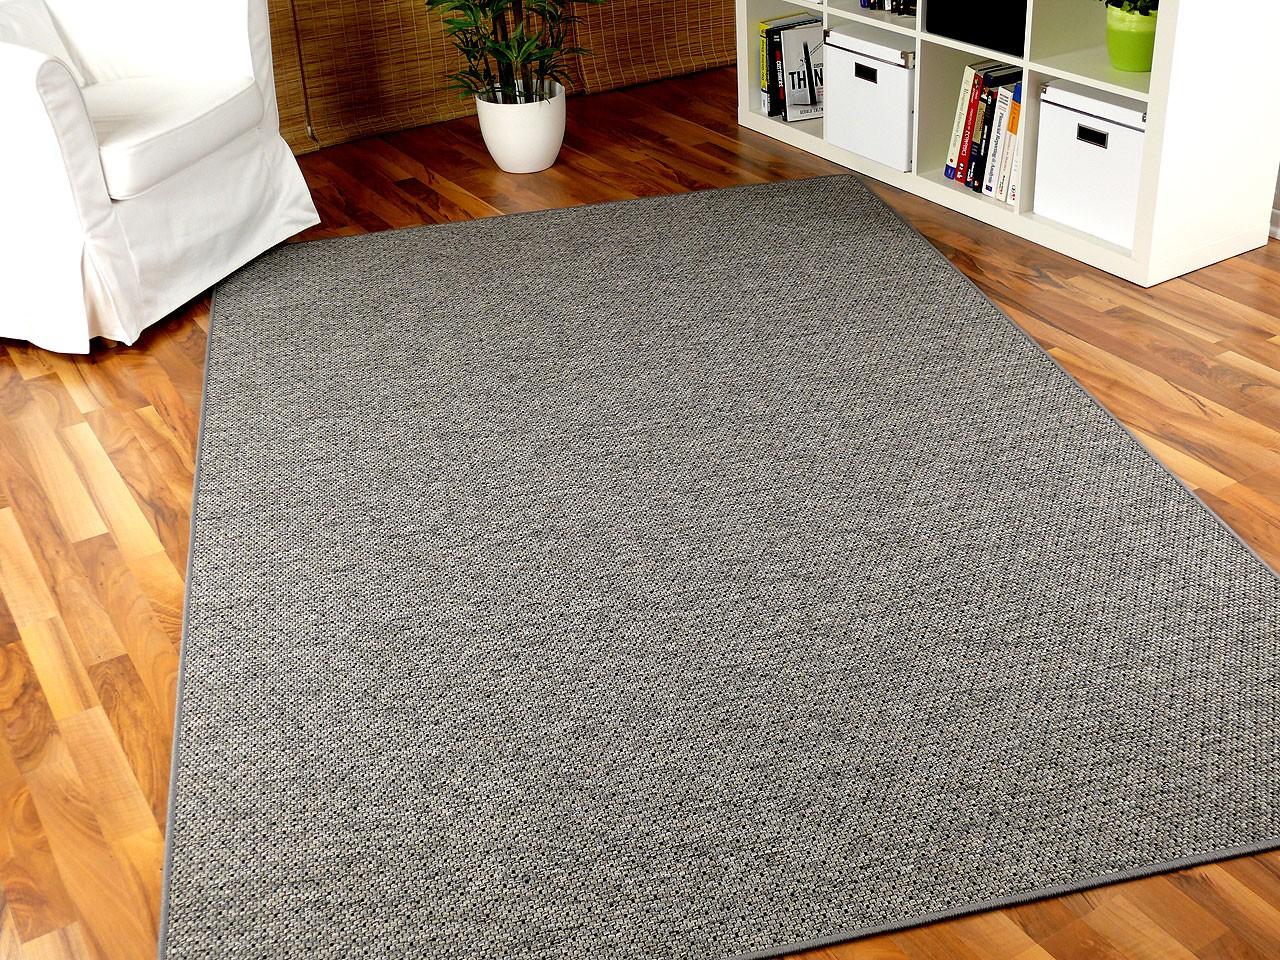 teppich bentzon flachgewebe grau blau schwarz trend. Black Bedroom Furniture Sets. Home Design Ideas